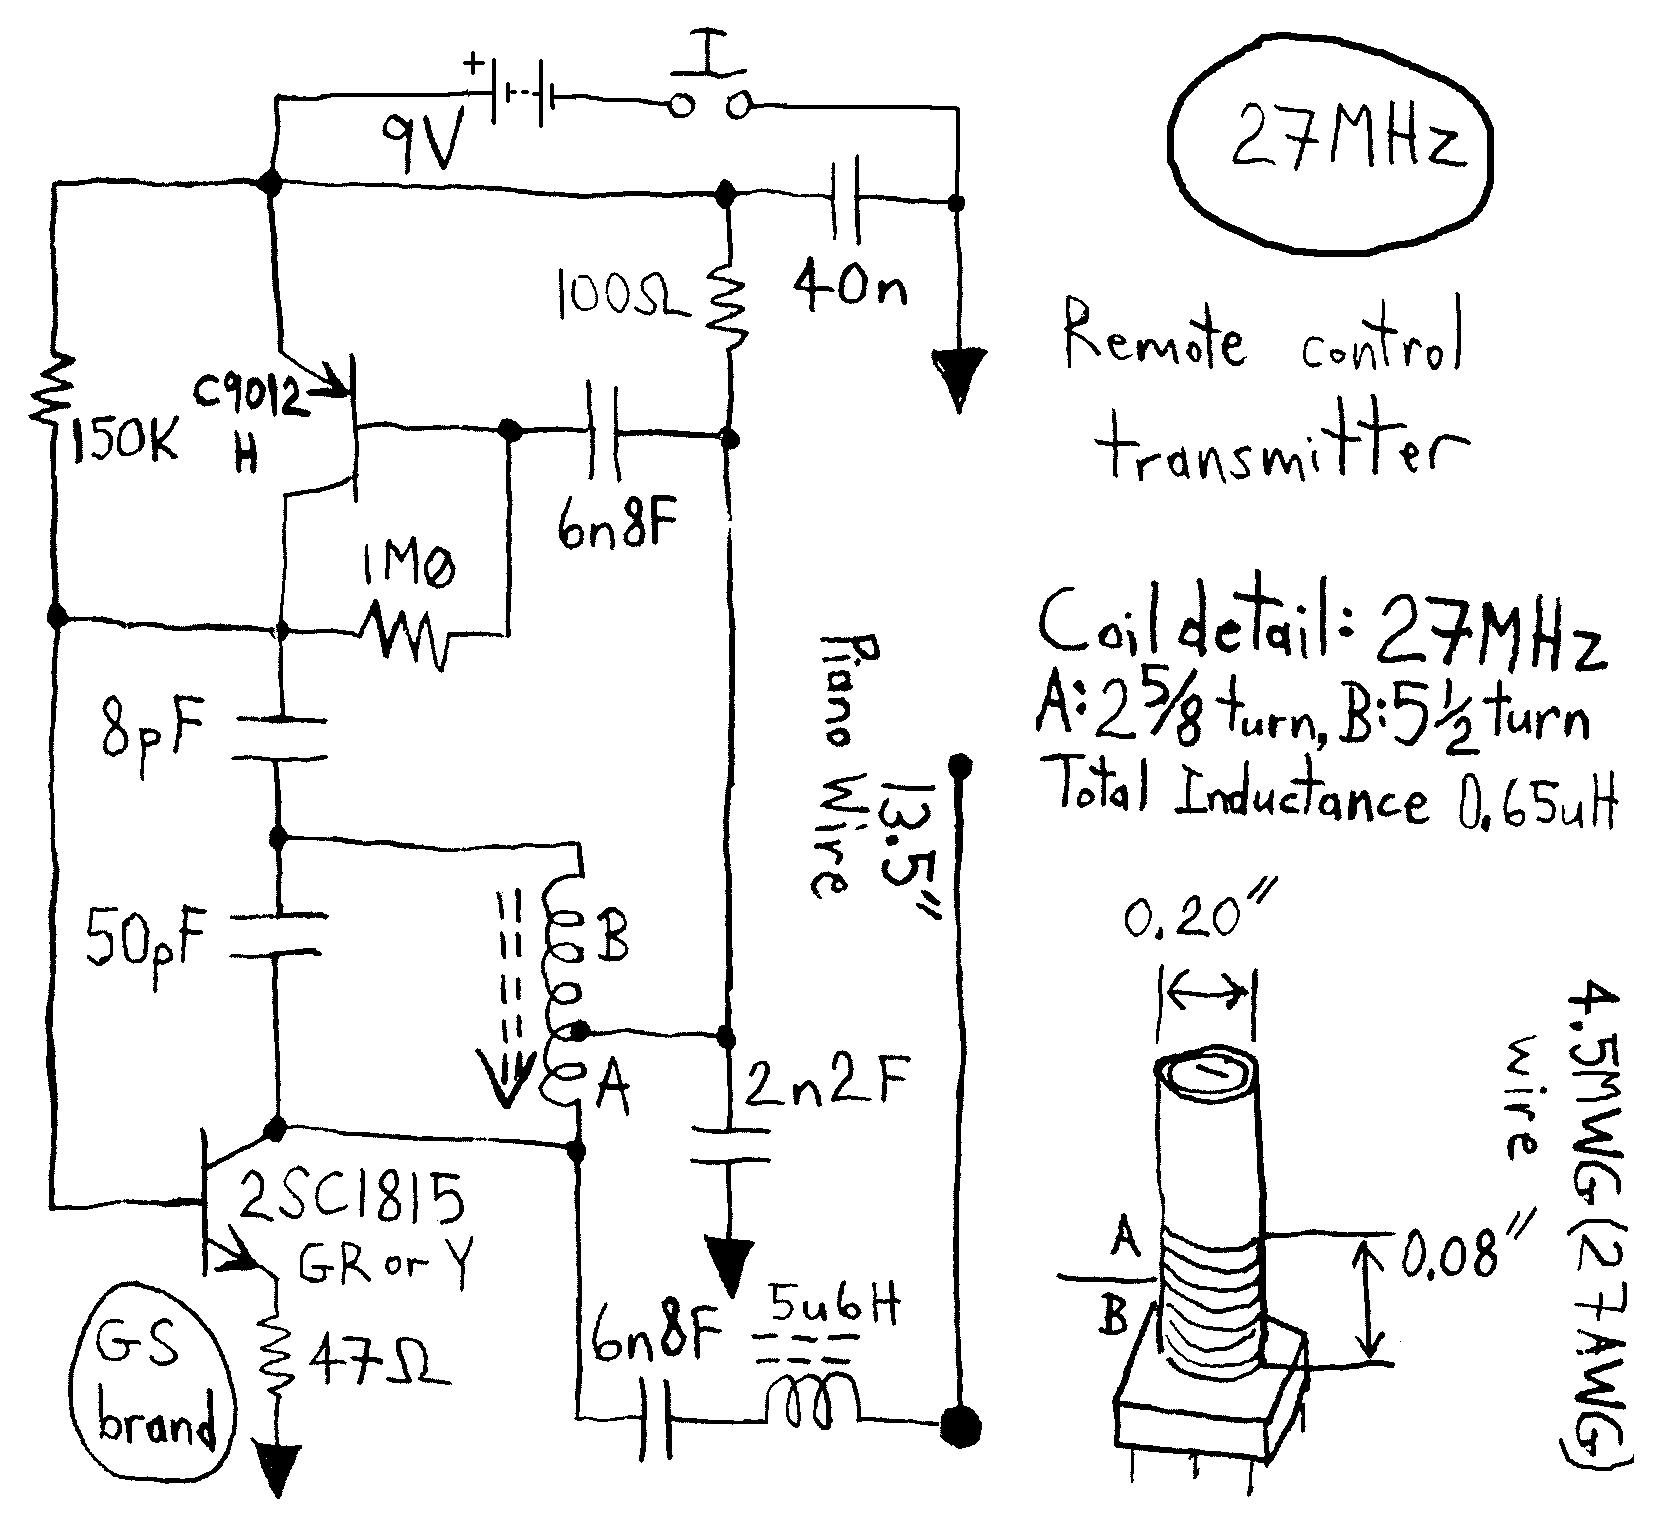 Gt Rf Gt Transmitters Gt Atv Jr Transmitter 440mhz Circuit